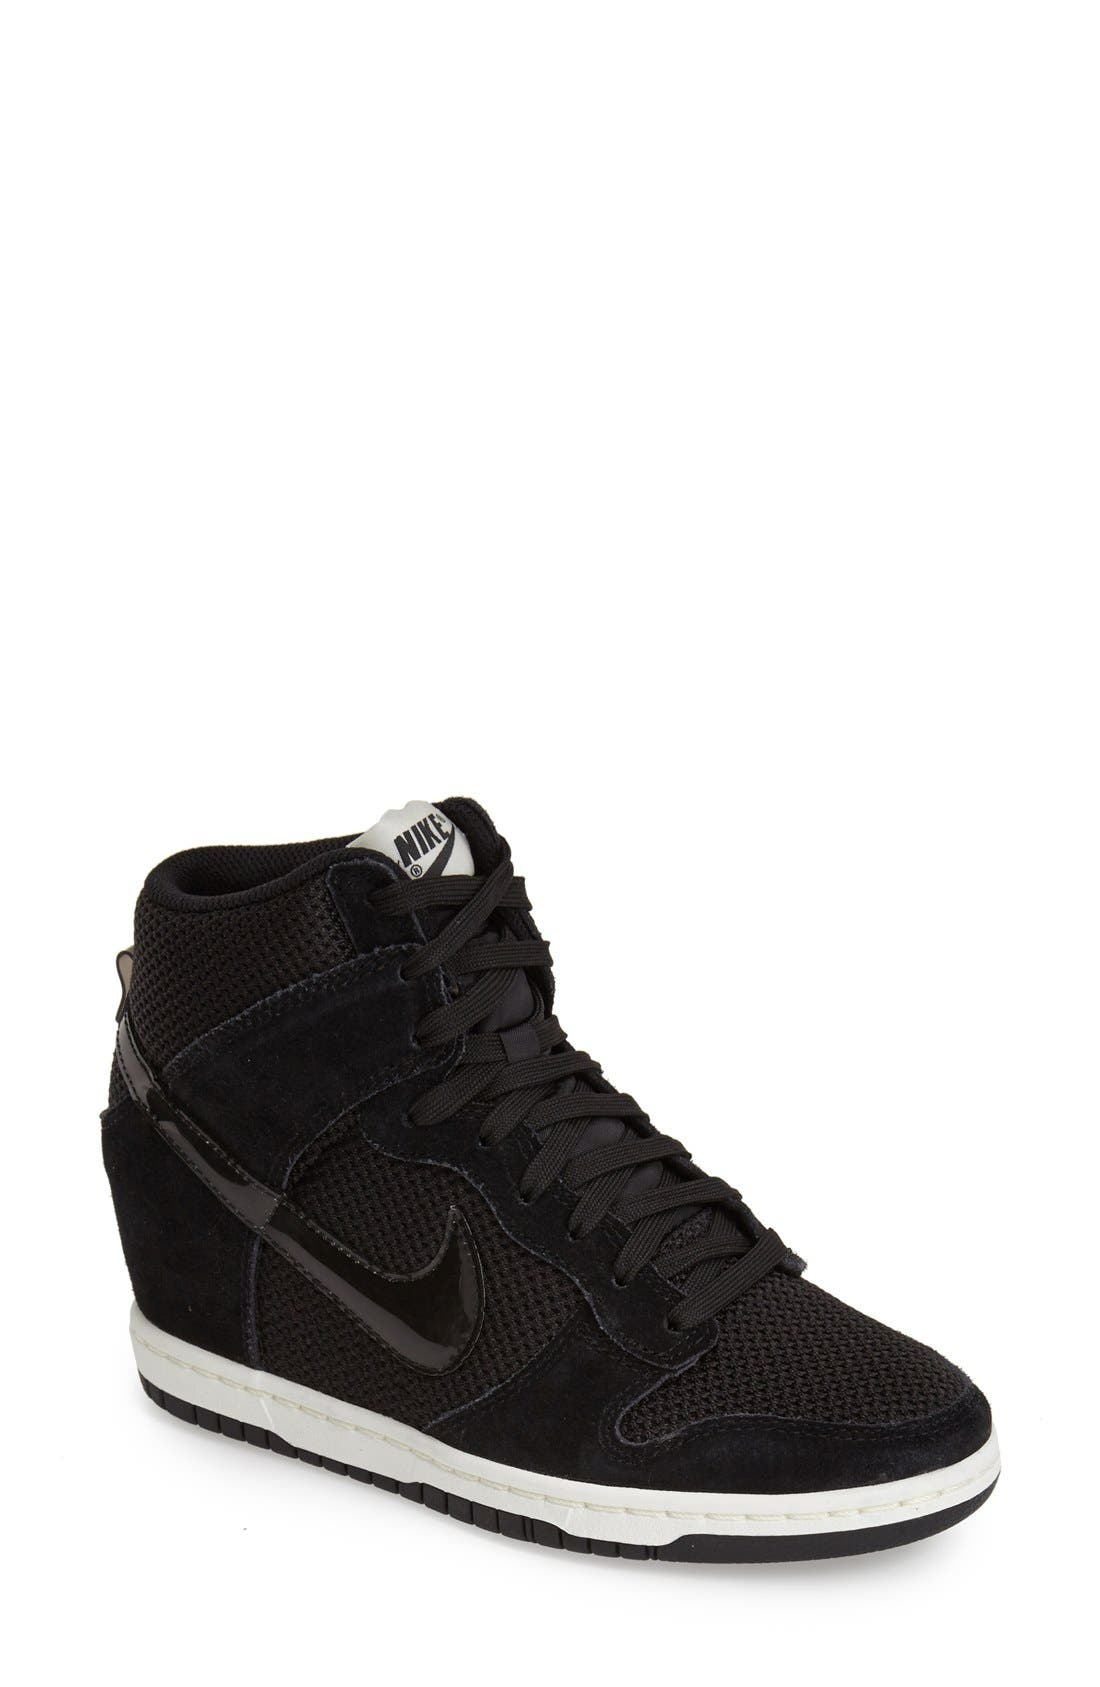 'Dunk Sky Hi - Essential' Wedge Sneaker, Main, color, 001